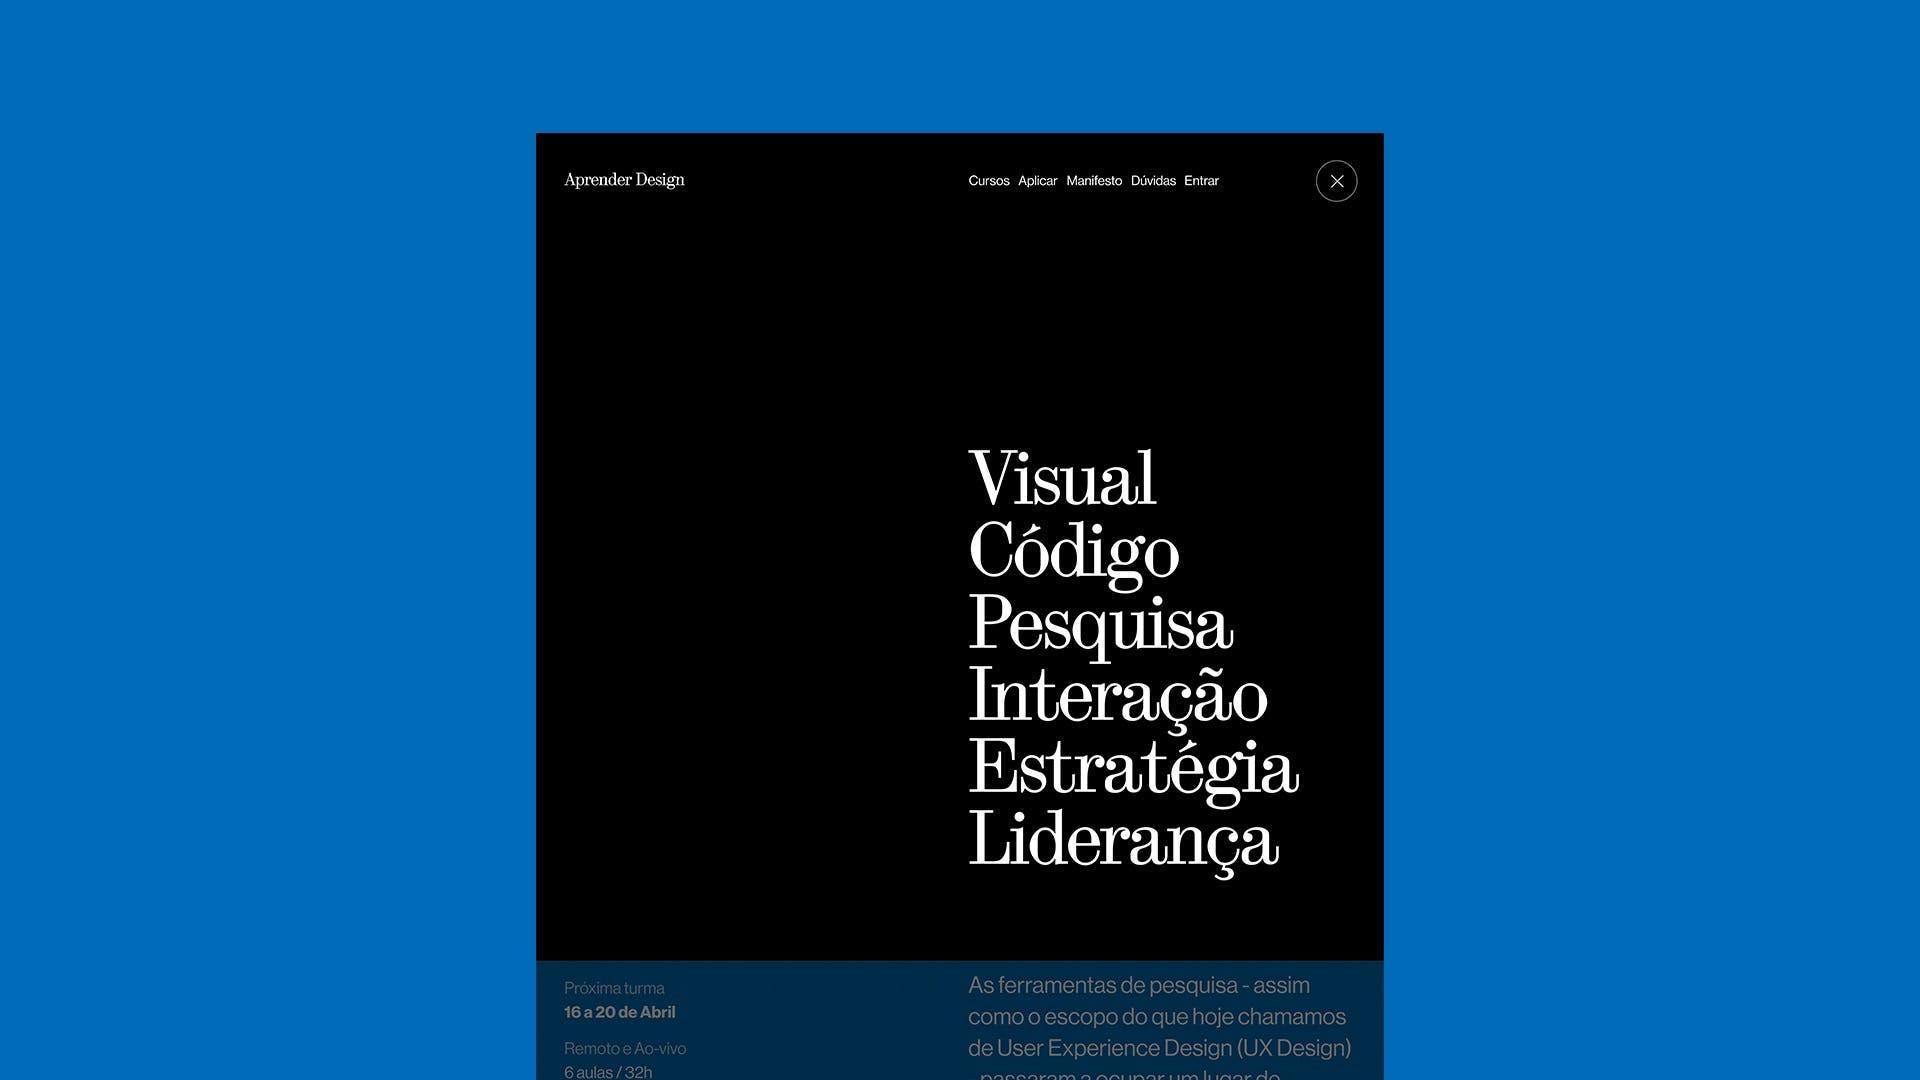 glauber-sampaio-aprender-design-14.jpeg